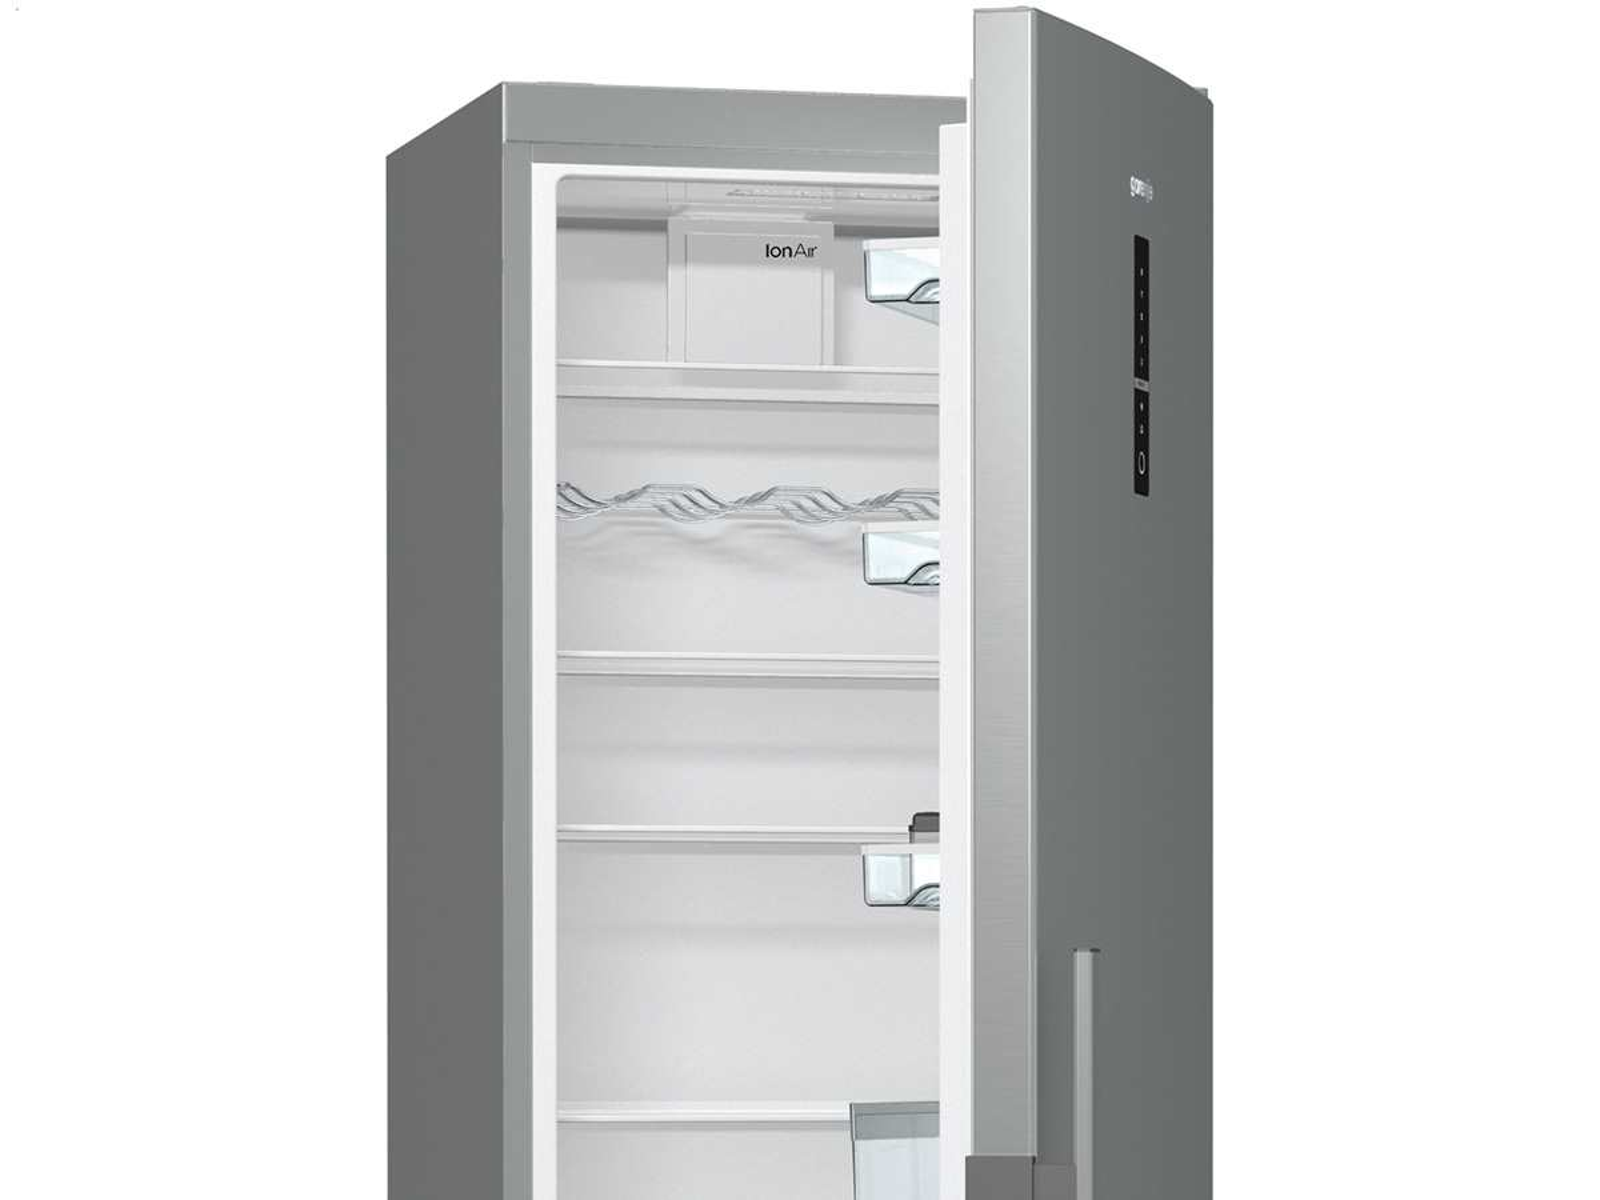 Gorenje Kühlschrank R 6192 Fw : Test gorenje r lx kühlschrank gorenje r lx kühlschrank a höhe cm